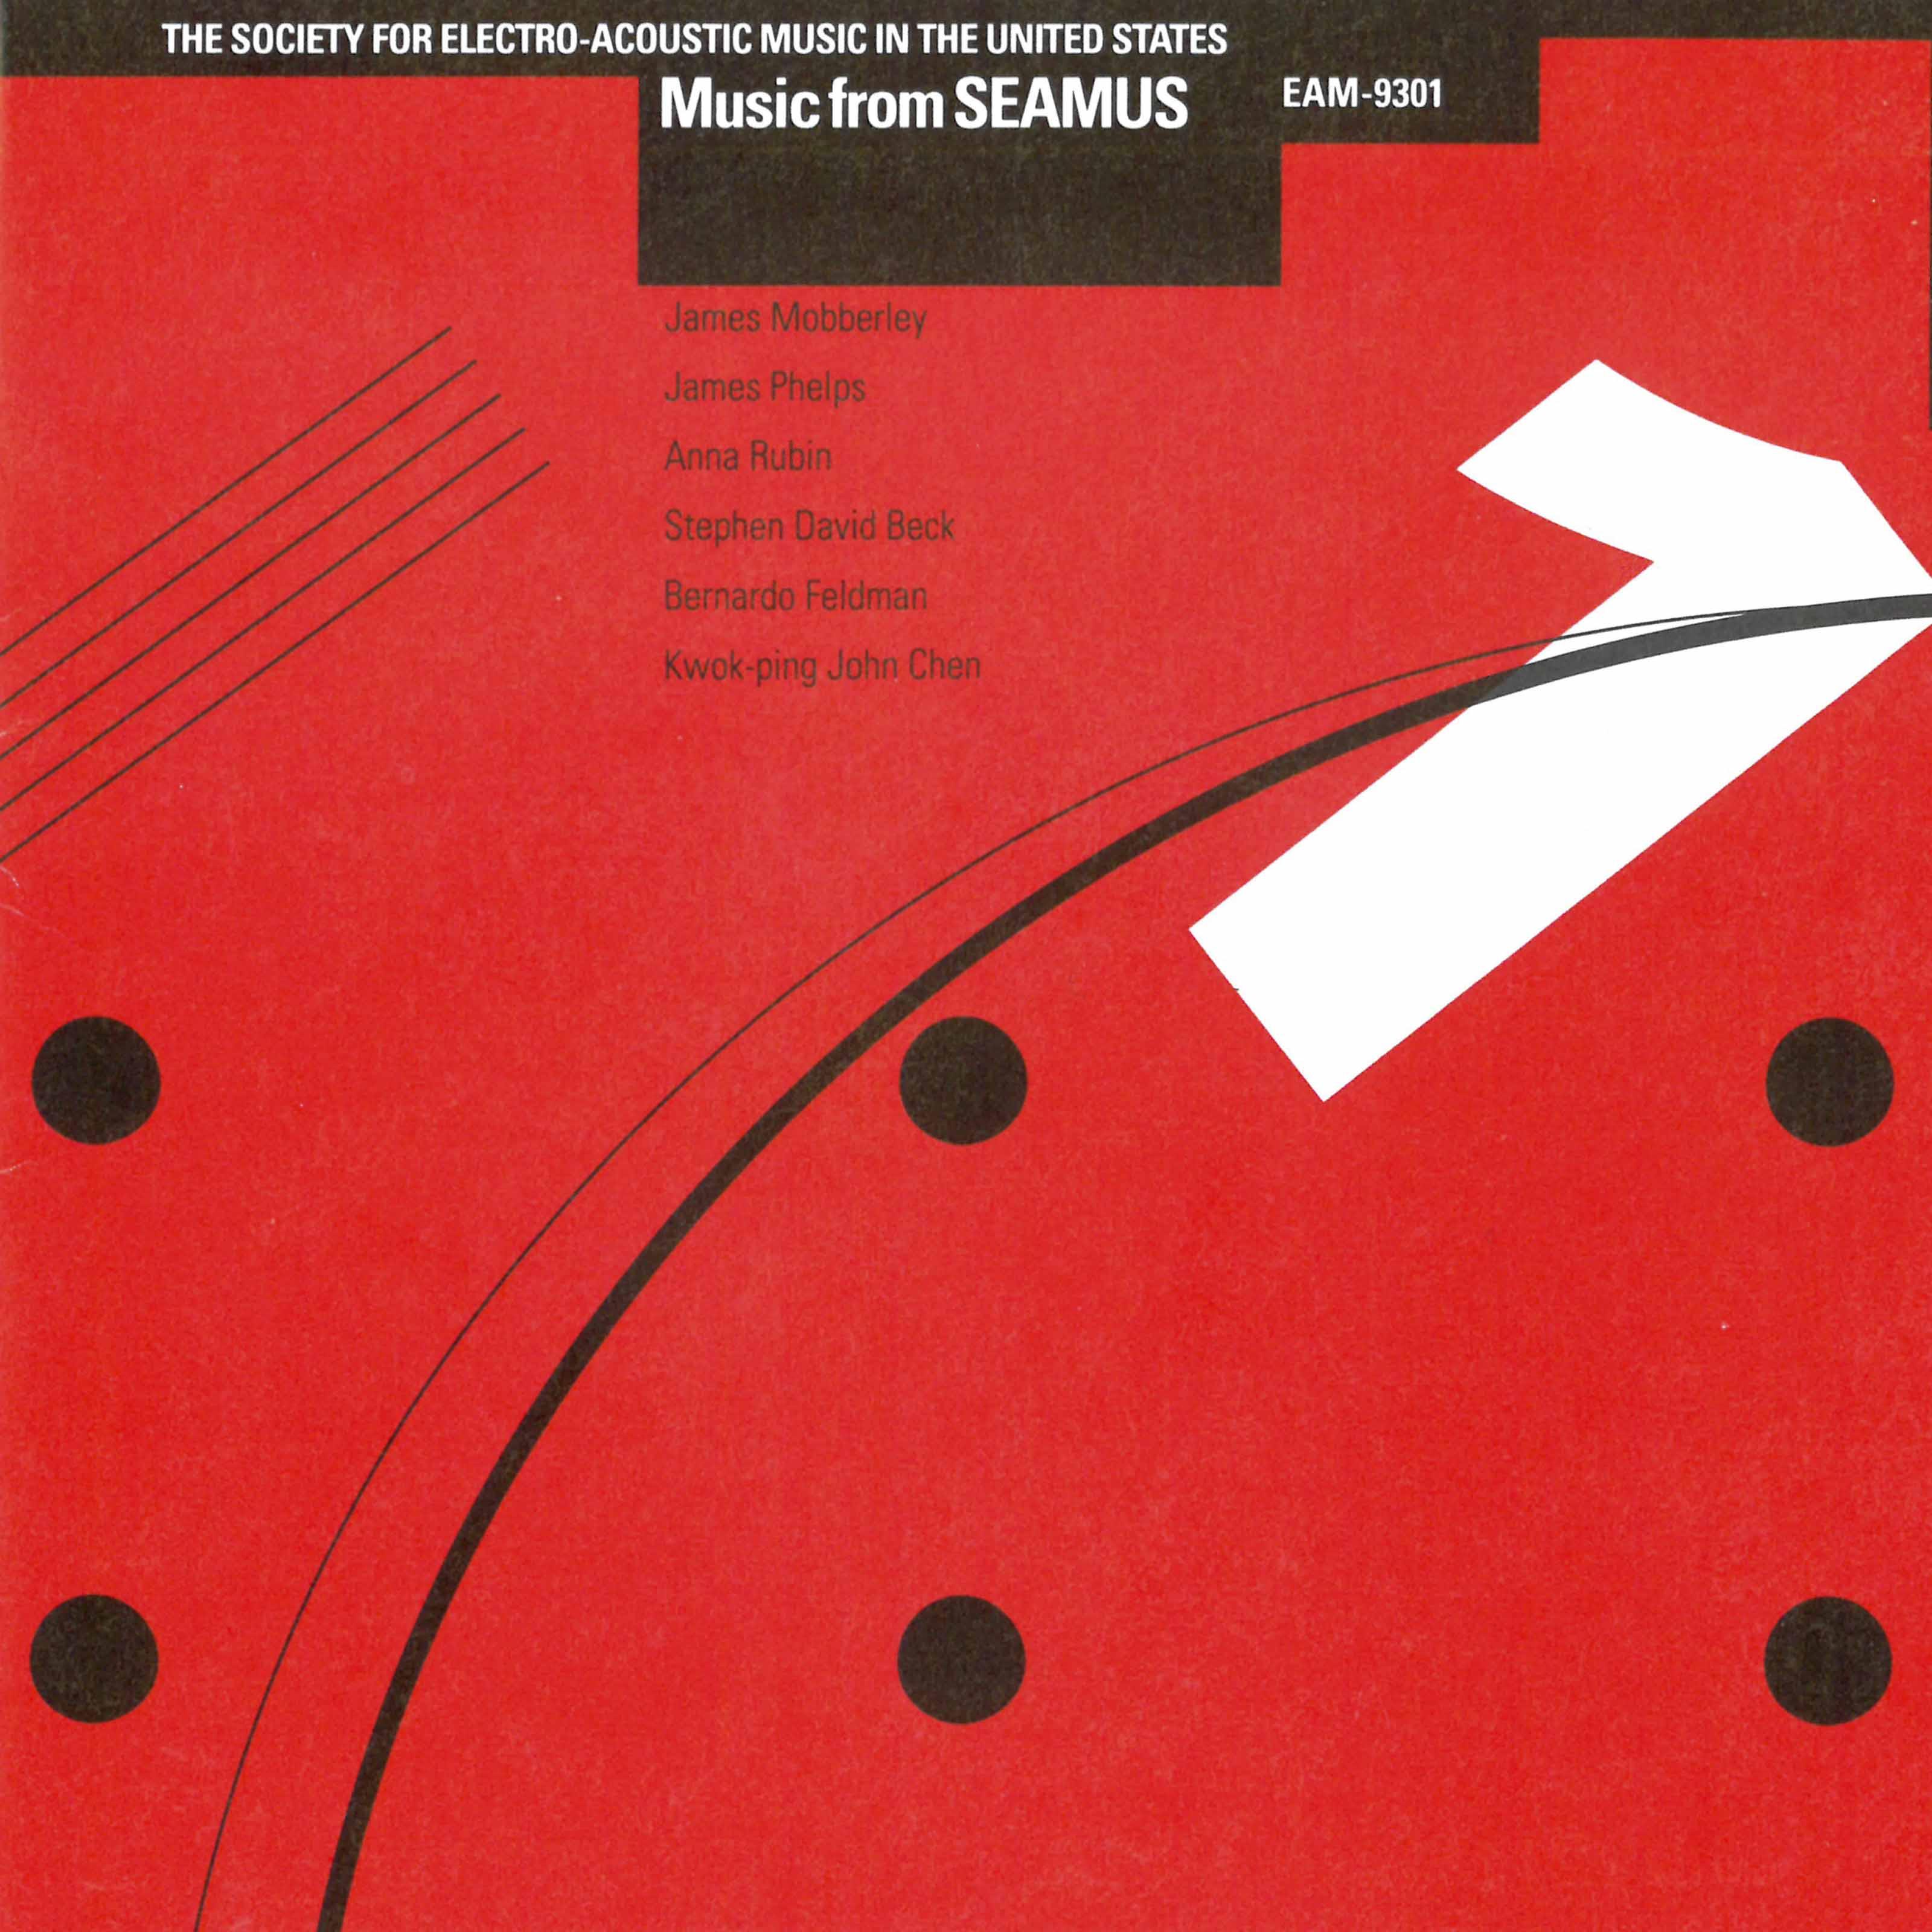 Music from SEAMUS, Vol. 1